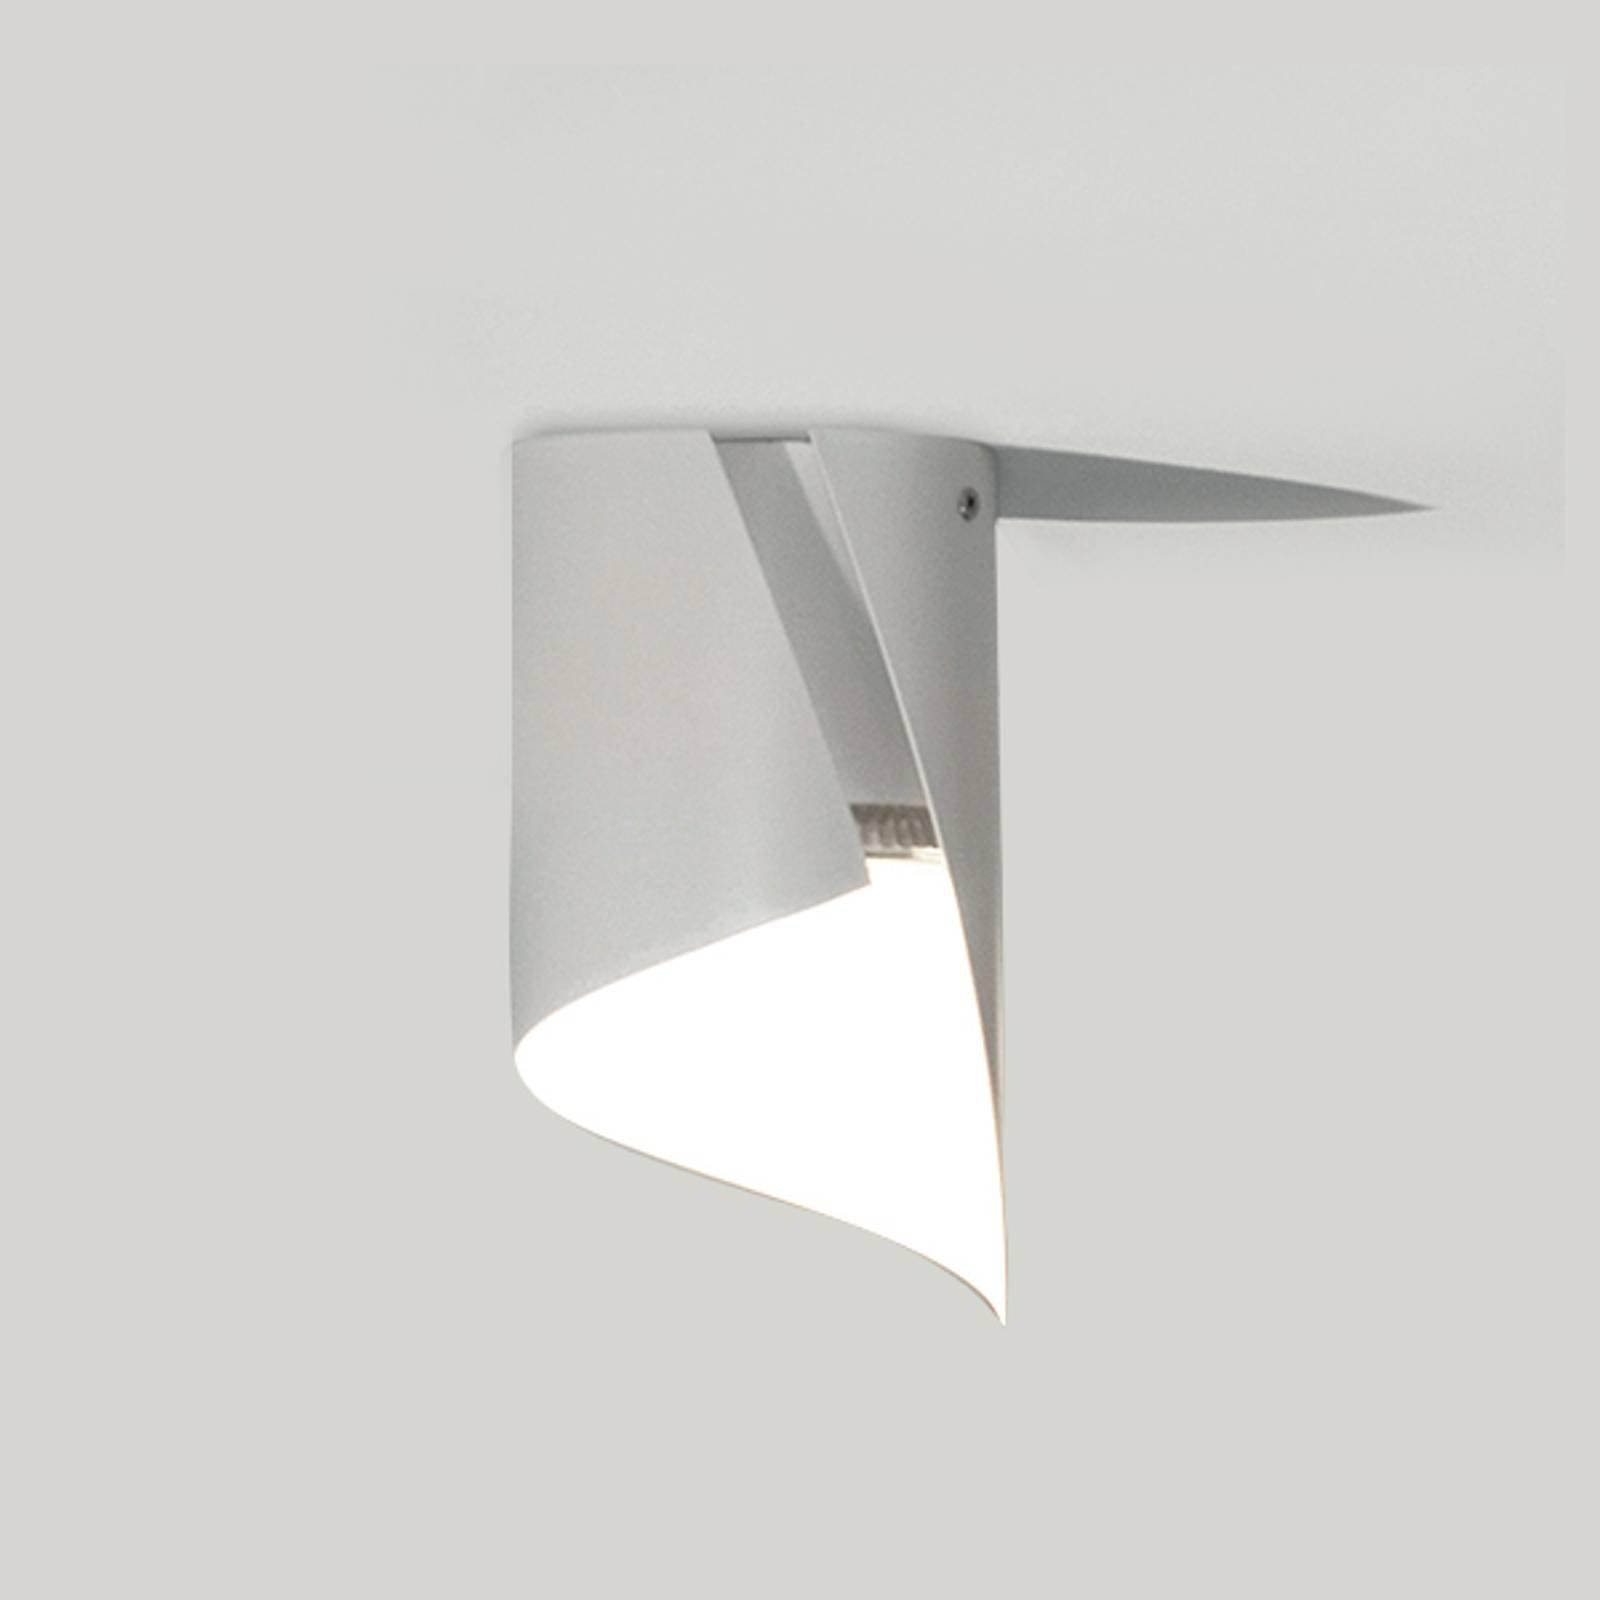 Knikerboker Hué-LED-taklampe 8 x 15 cm hvit